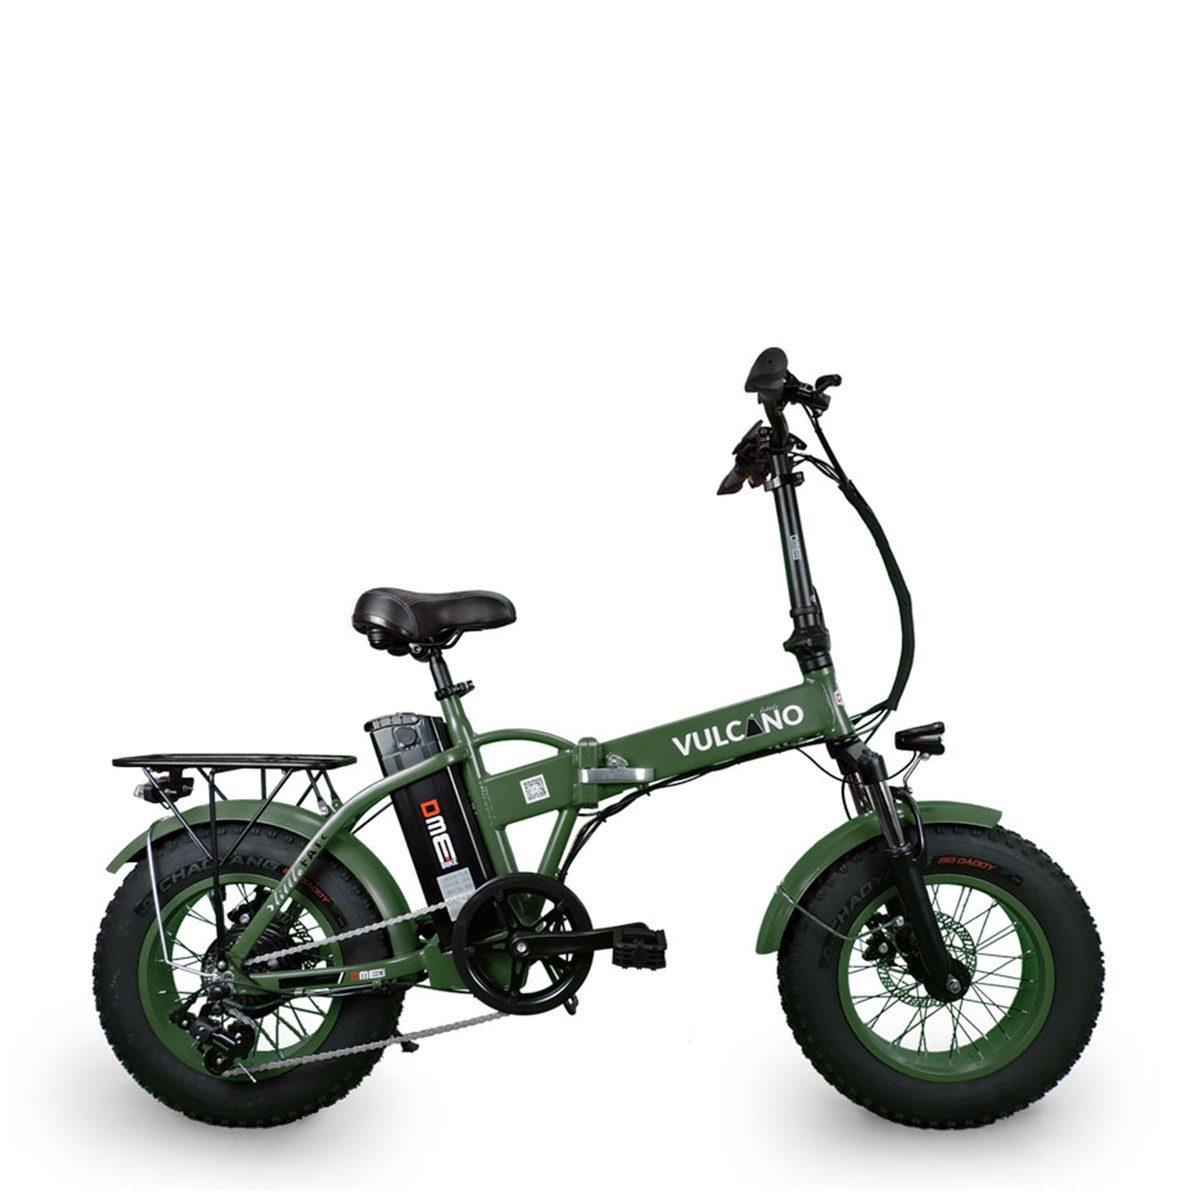 Bicicletta Vulcano Usata